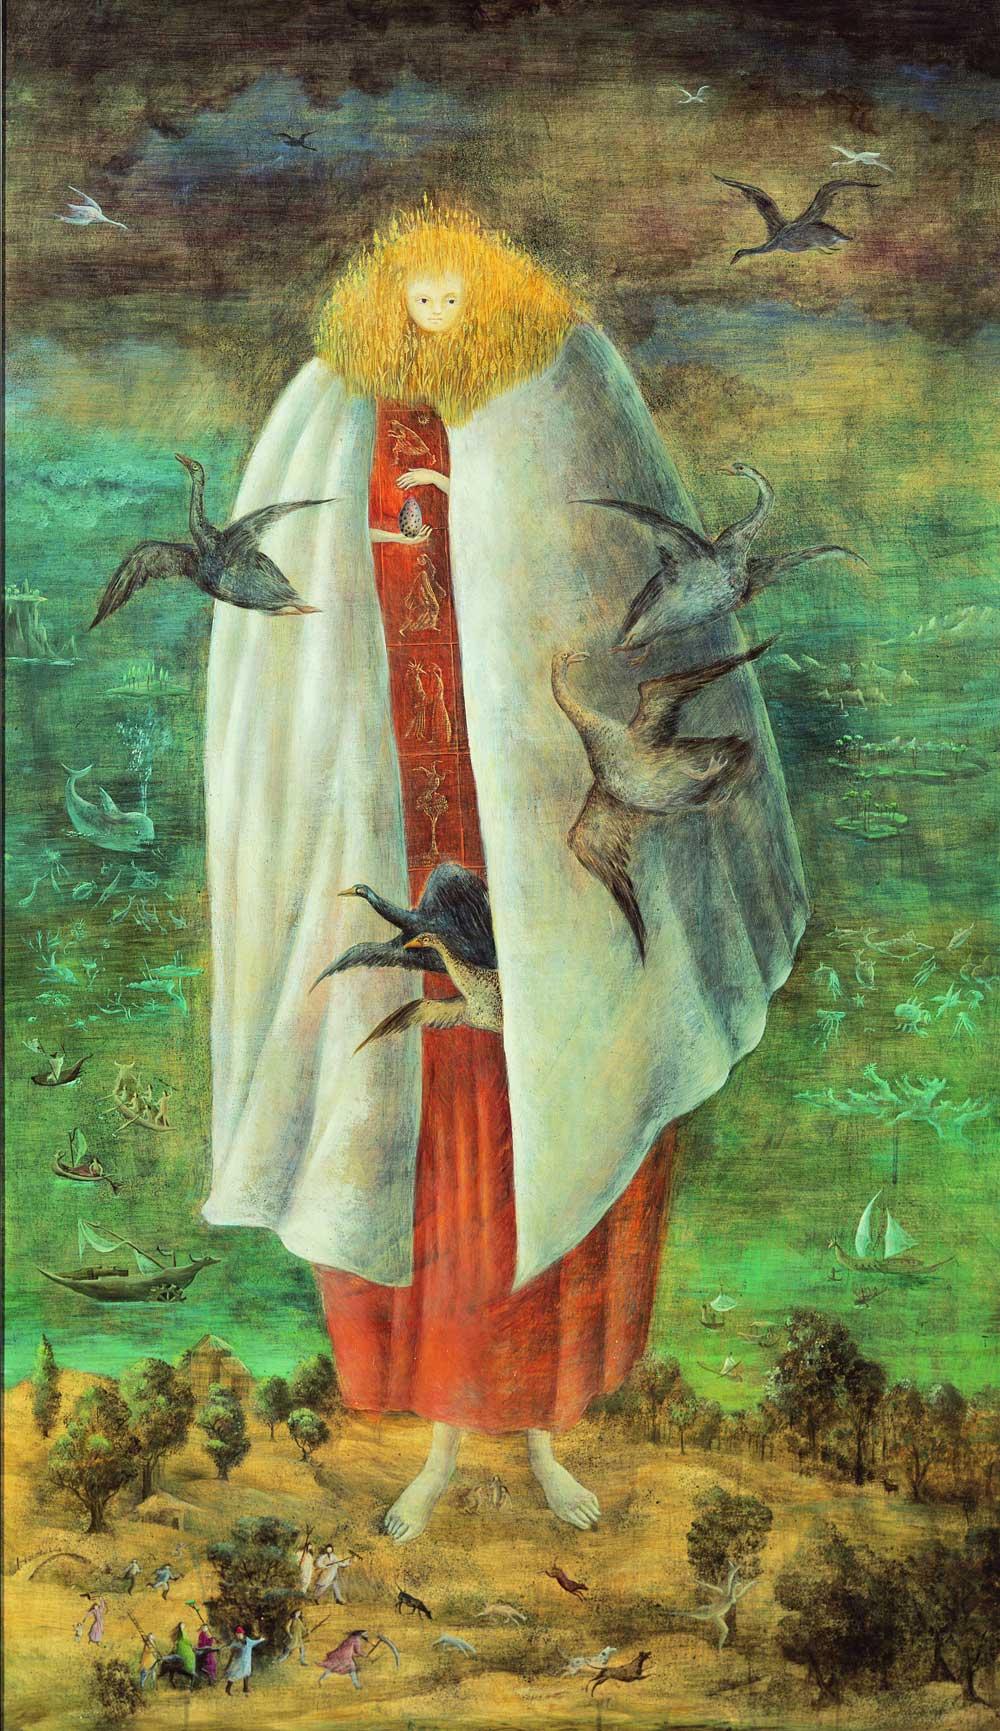 Leonora carrington, the giantess2